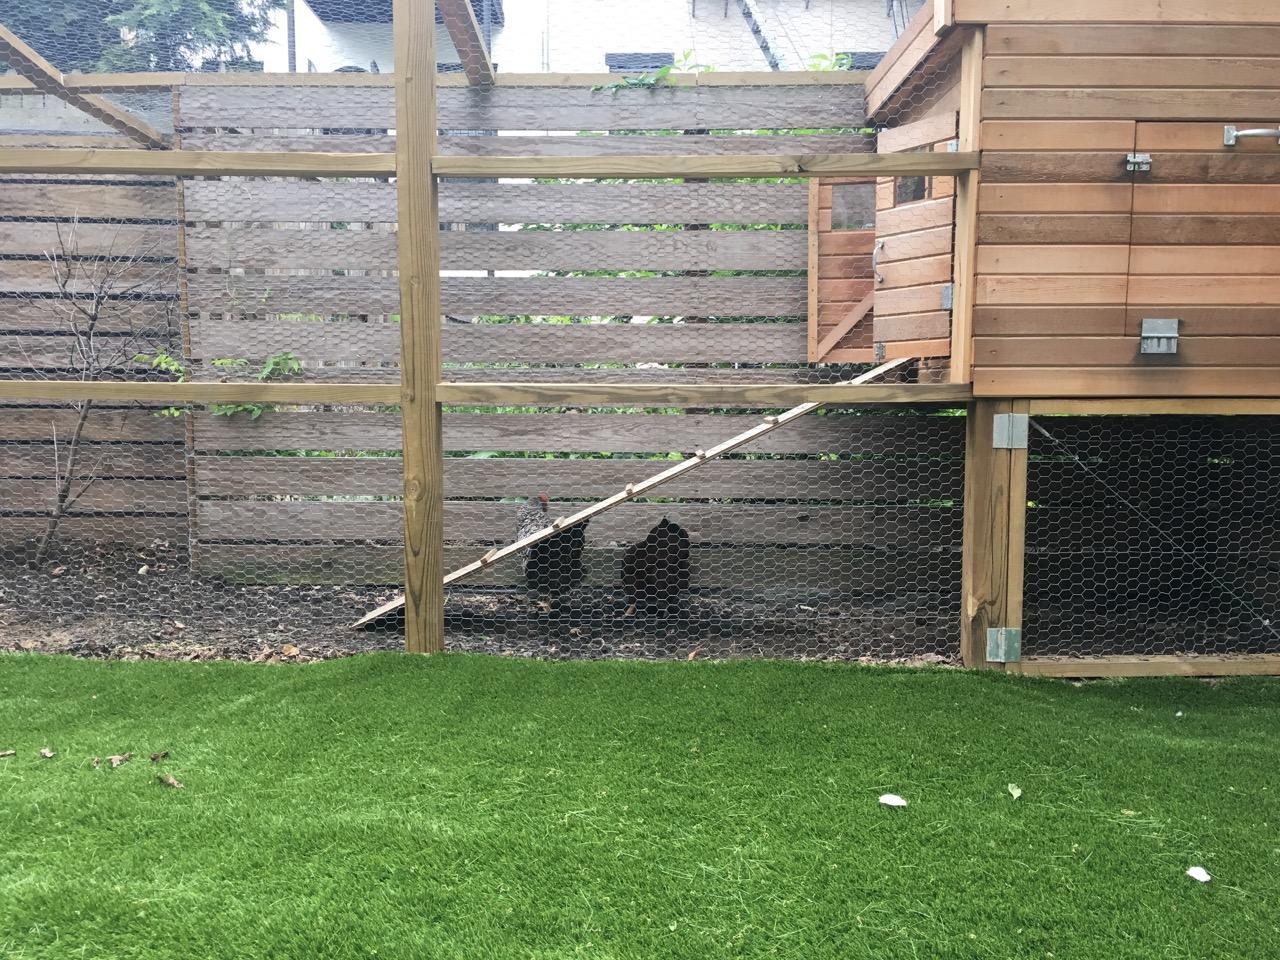 chicken-coop-backyard-brooklyn-garden-by-edible-petals-brooklyn-3.jpg